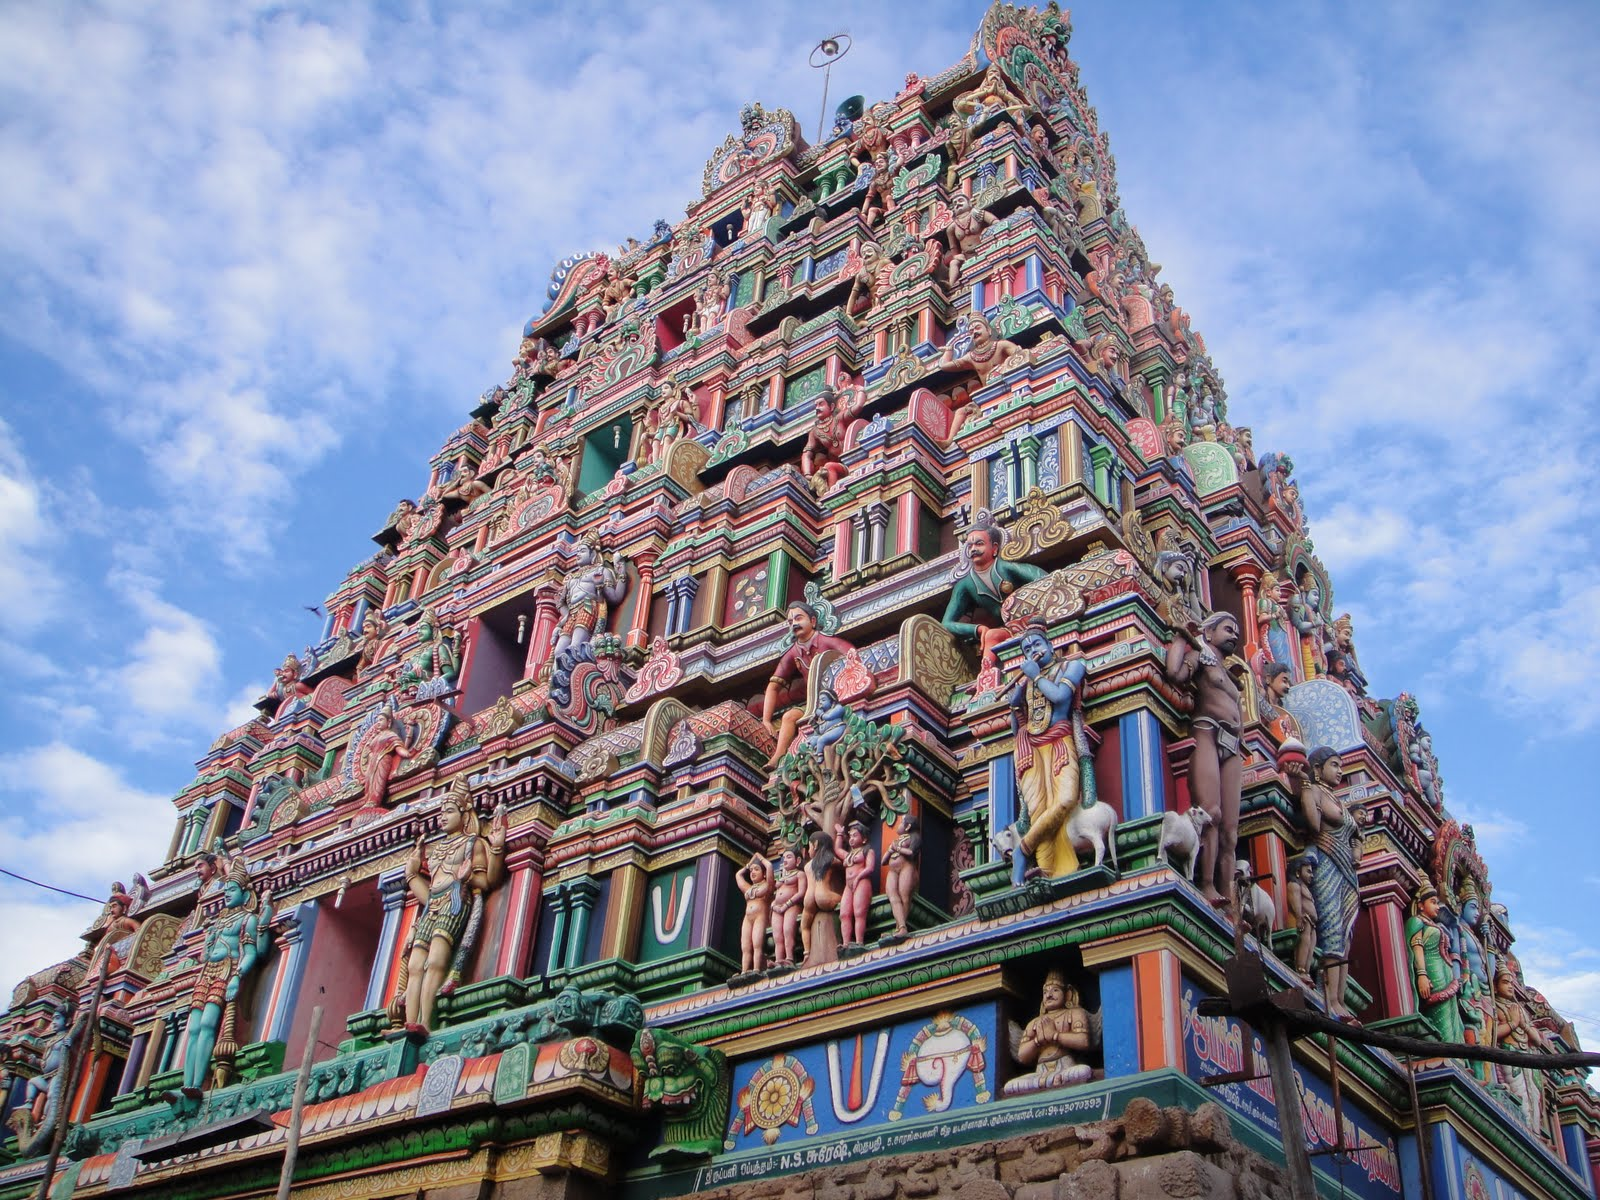 Oppiliappan or Uppaliappan Temple, Kumbakonam, Tamil Nadu